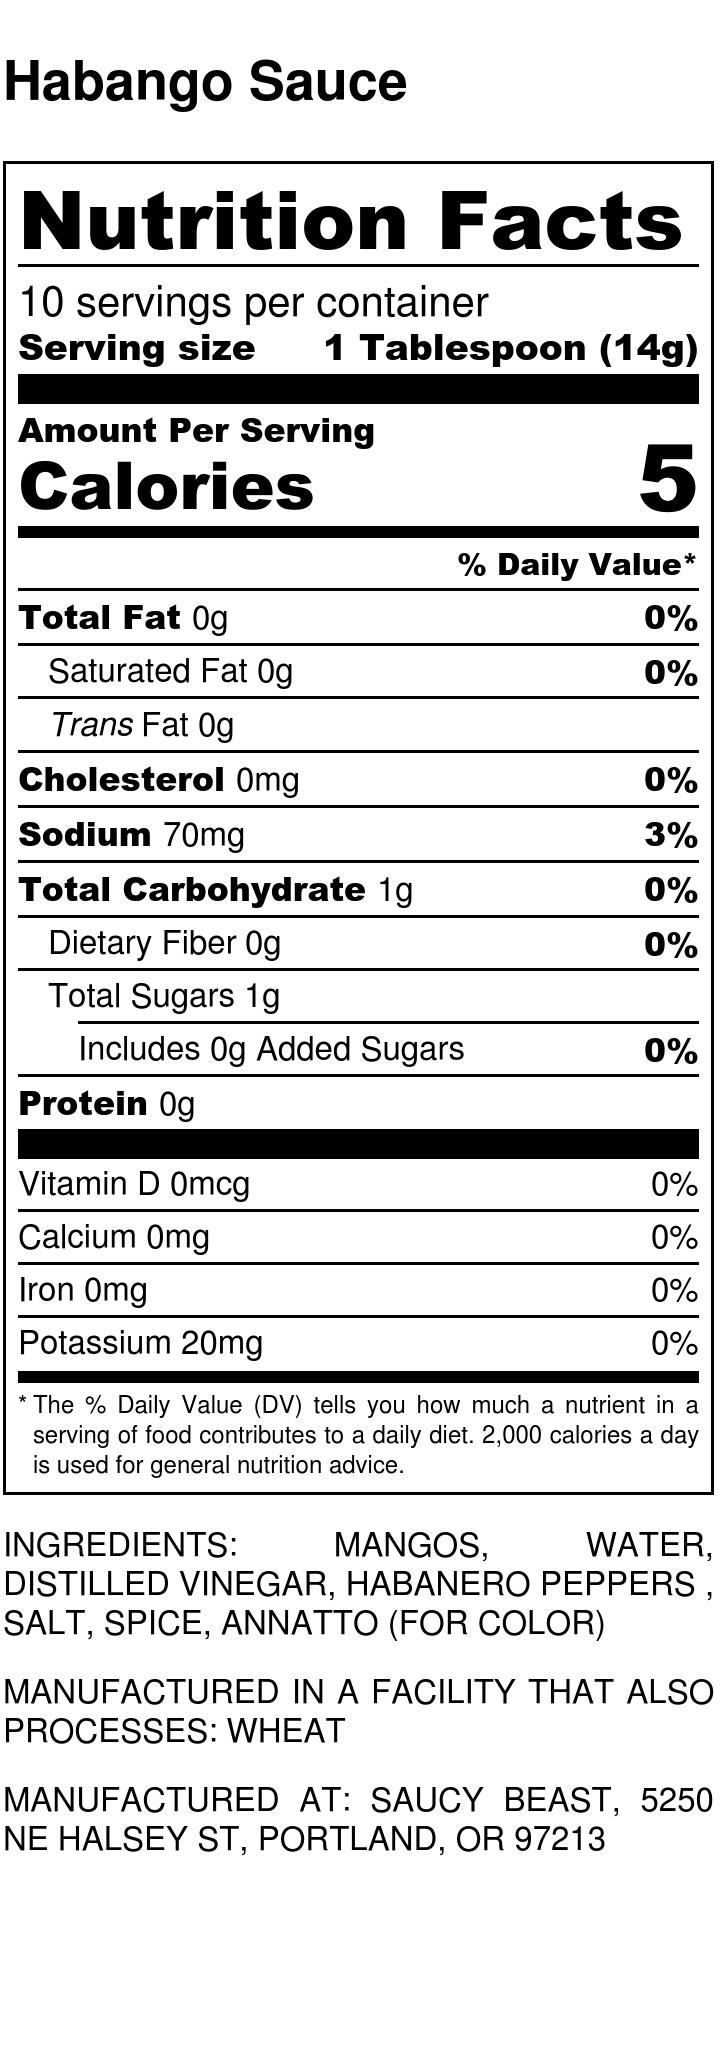 Habango Sauce - Nutrition Label